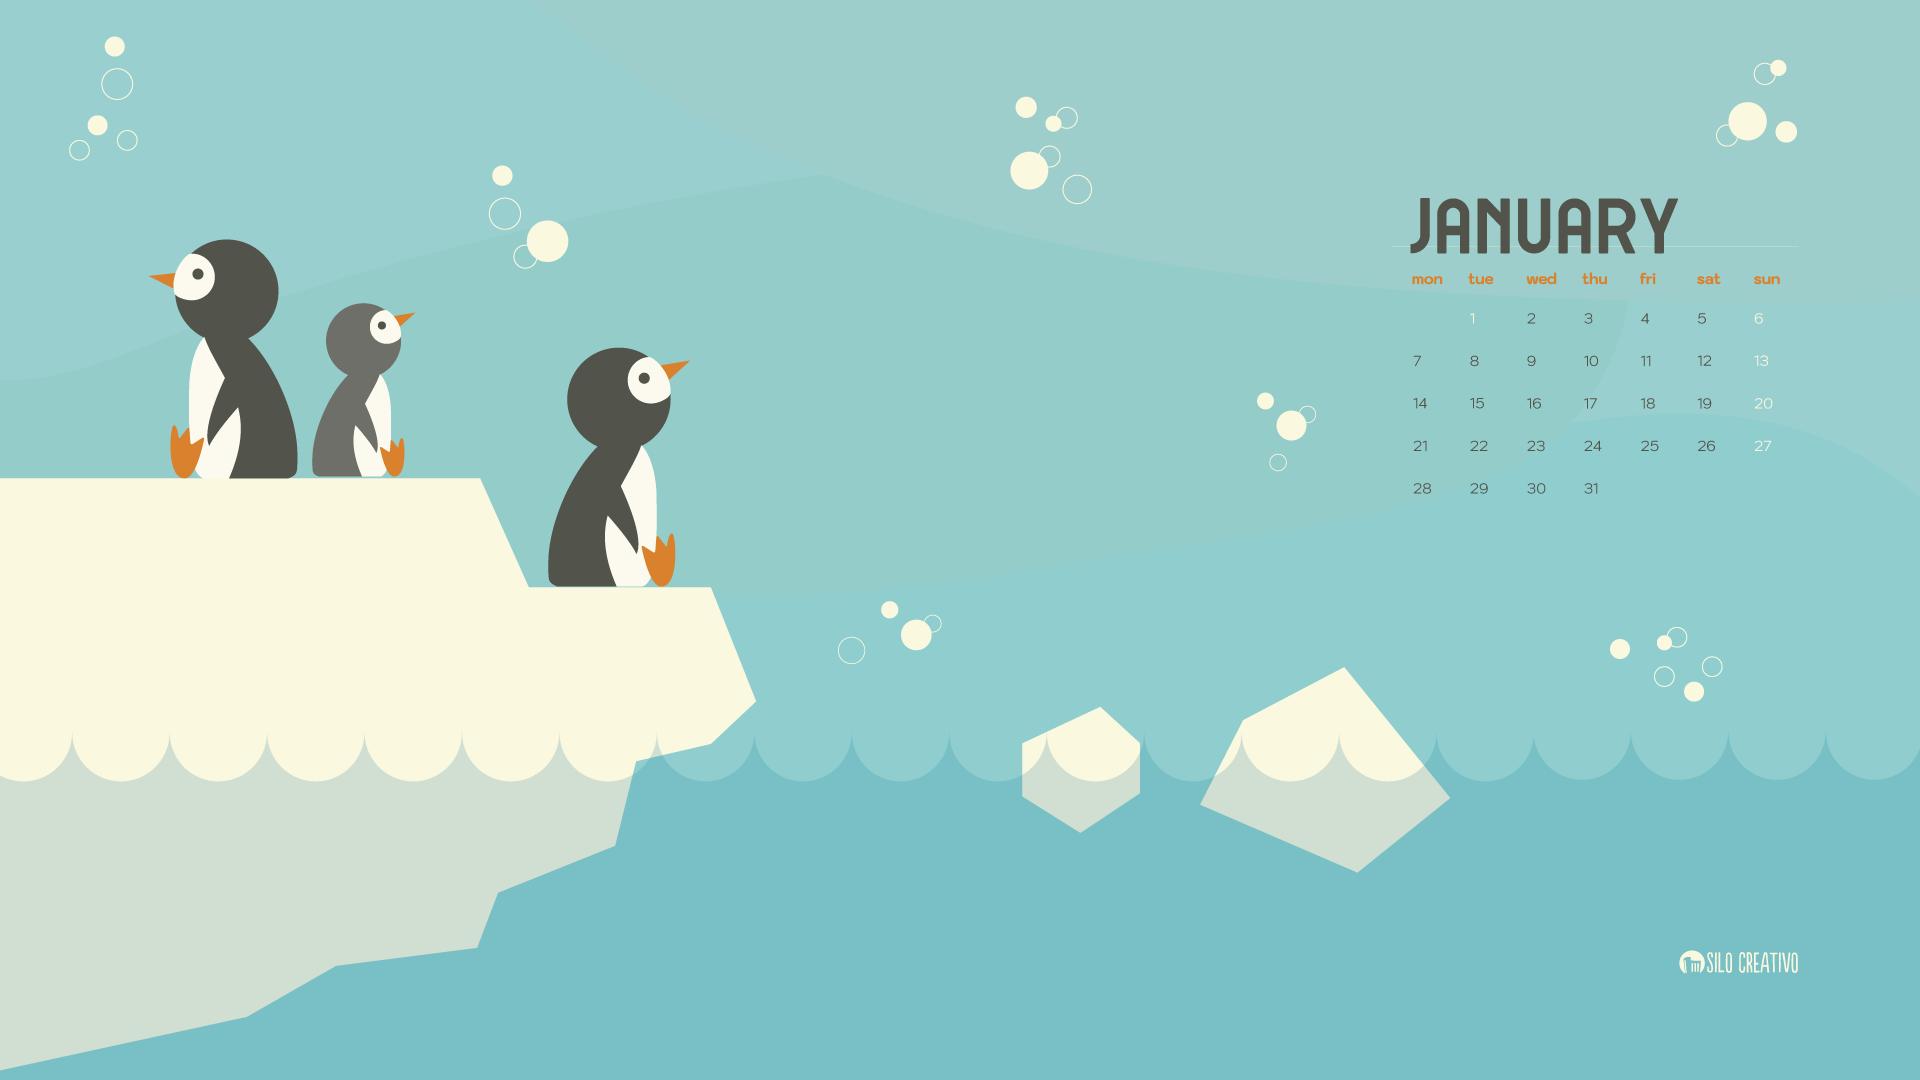 Downloadable Calendar: January 2020 • Silo Creativo